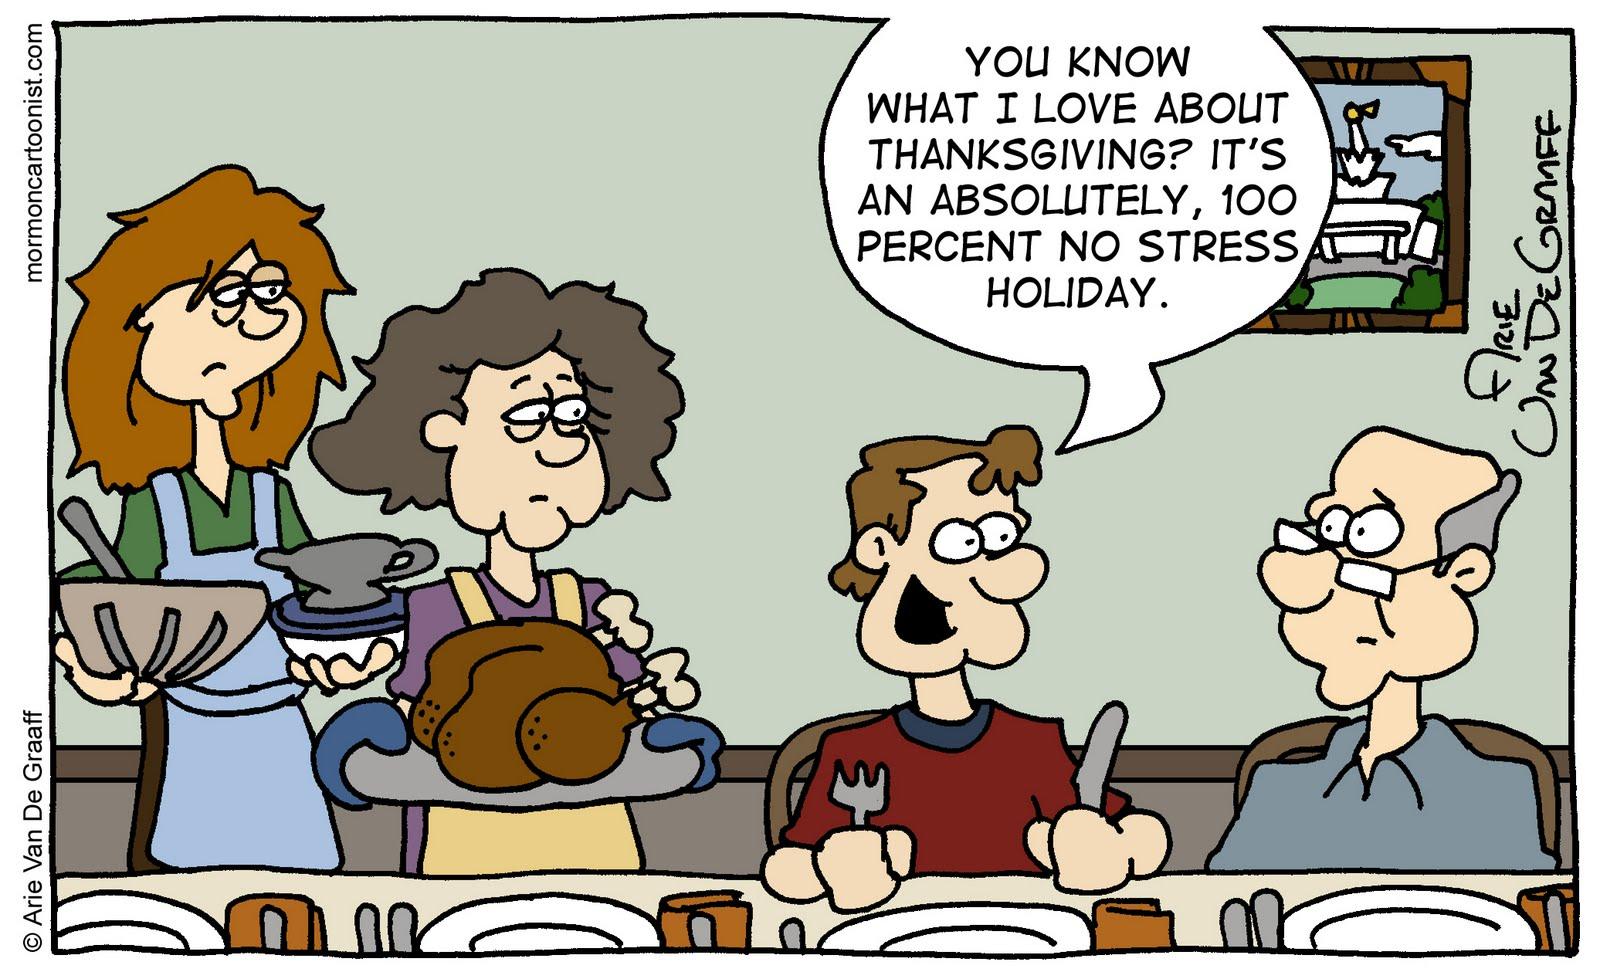 https://cdn.quotesgram.com/img/64/29/1150002756-Stress-free_Thanksgiving.jpg